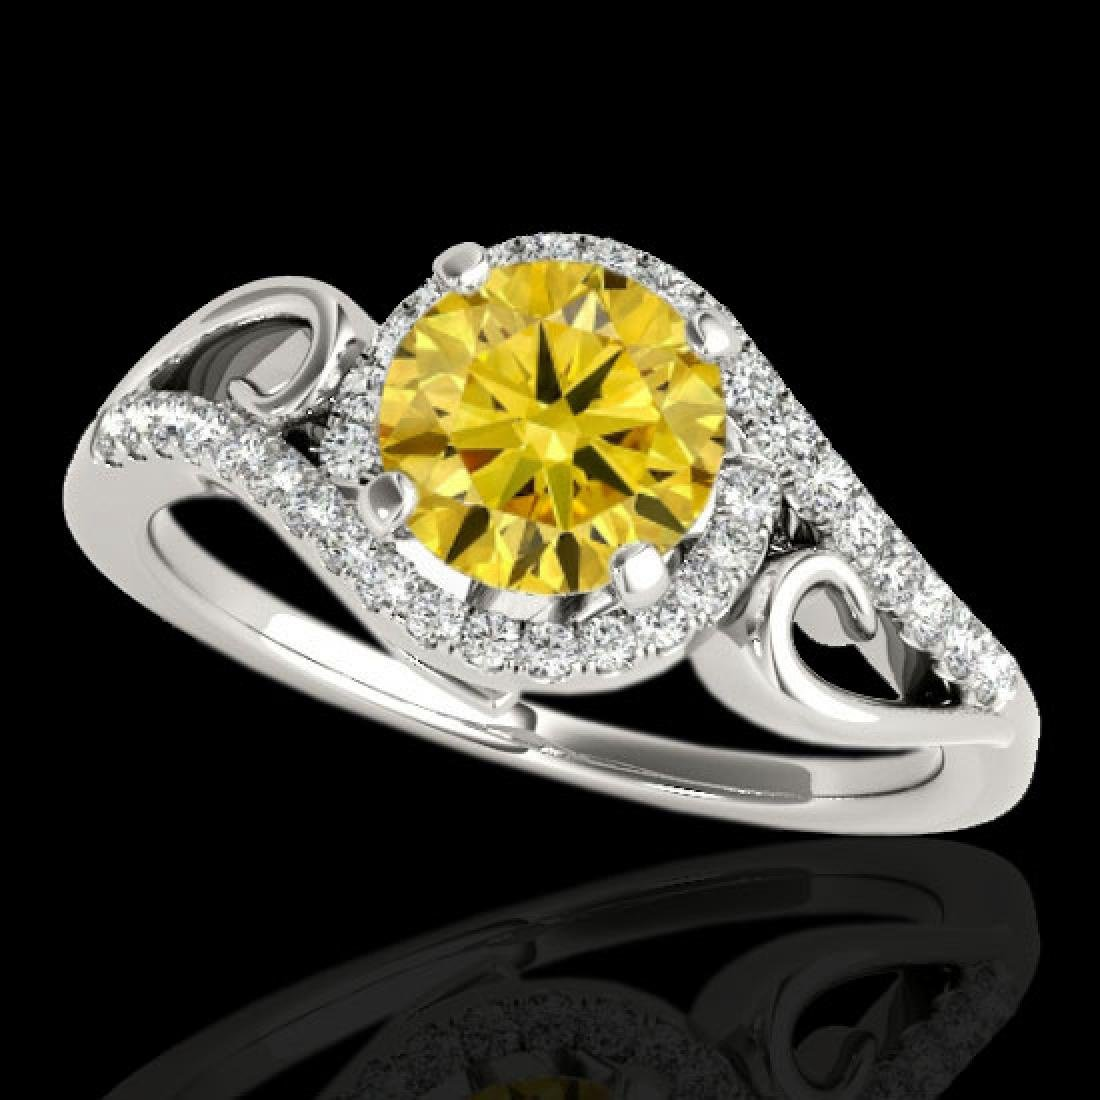 1.25 CTW Certified Si Fancy Intense Diamond Solitaire